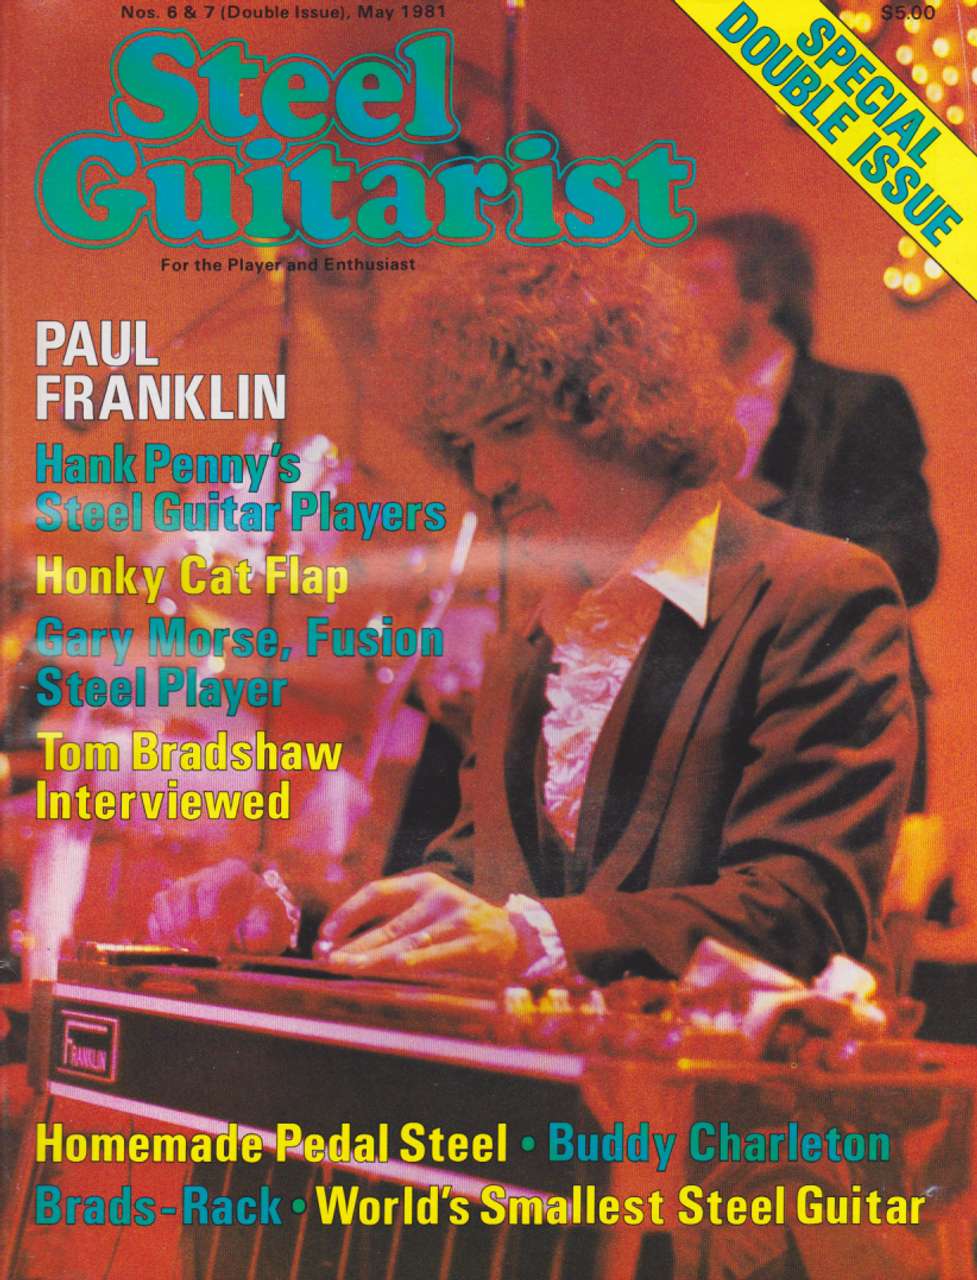 Steel Guitarist Magazine - All 6 Issues